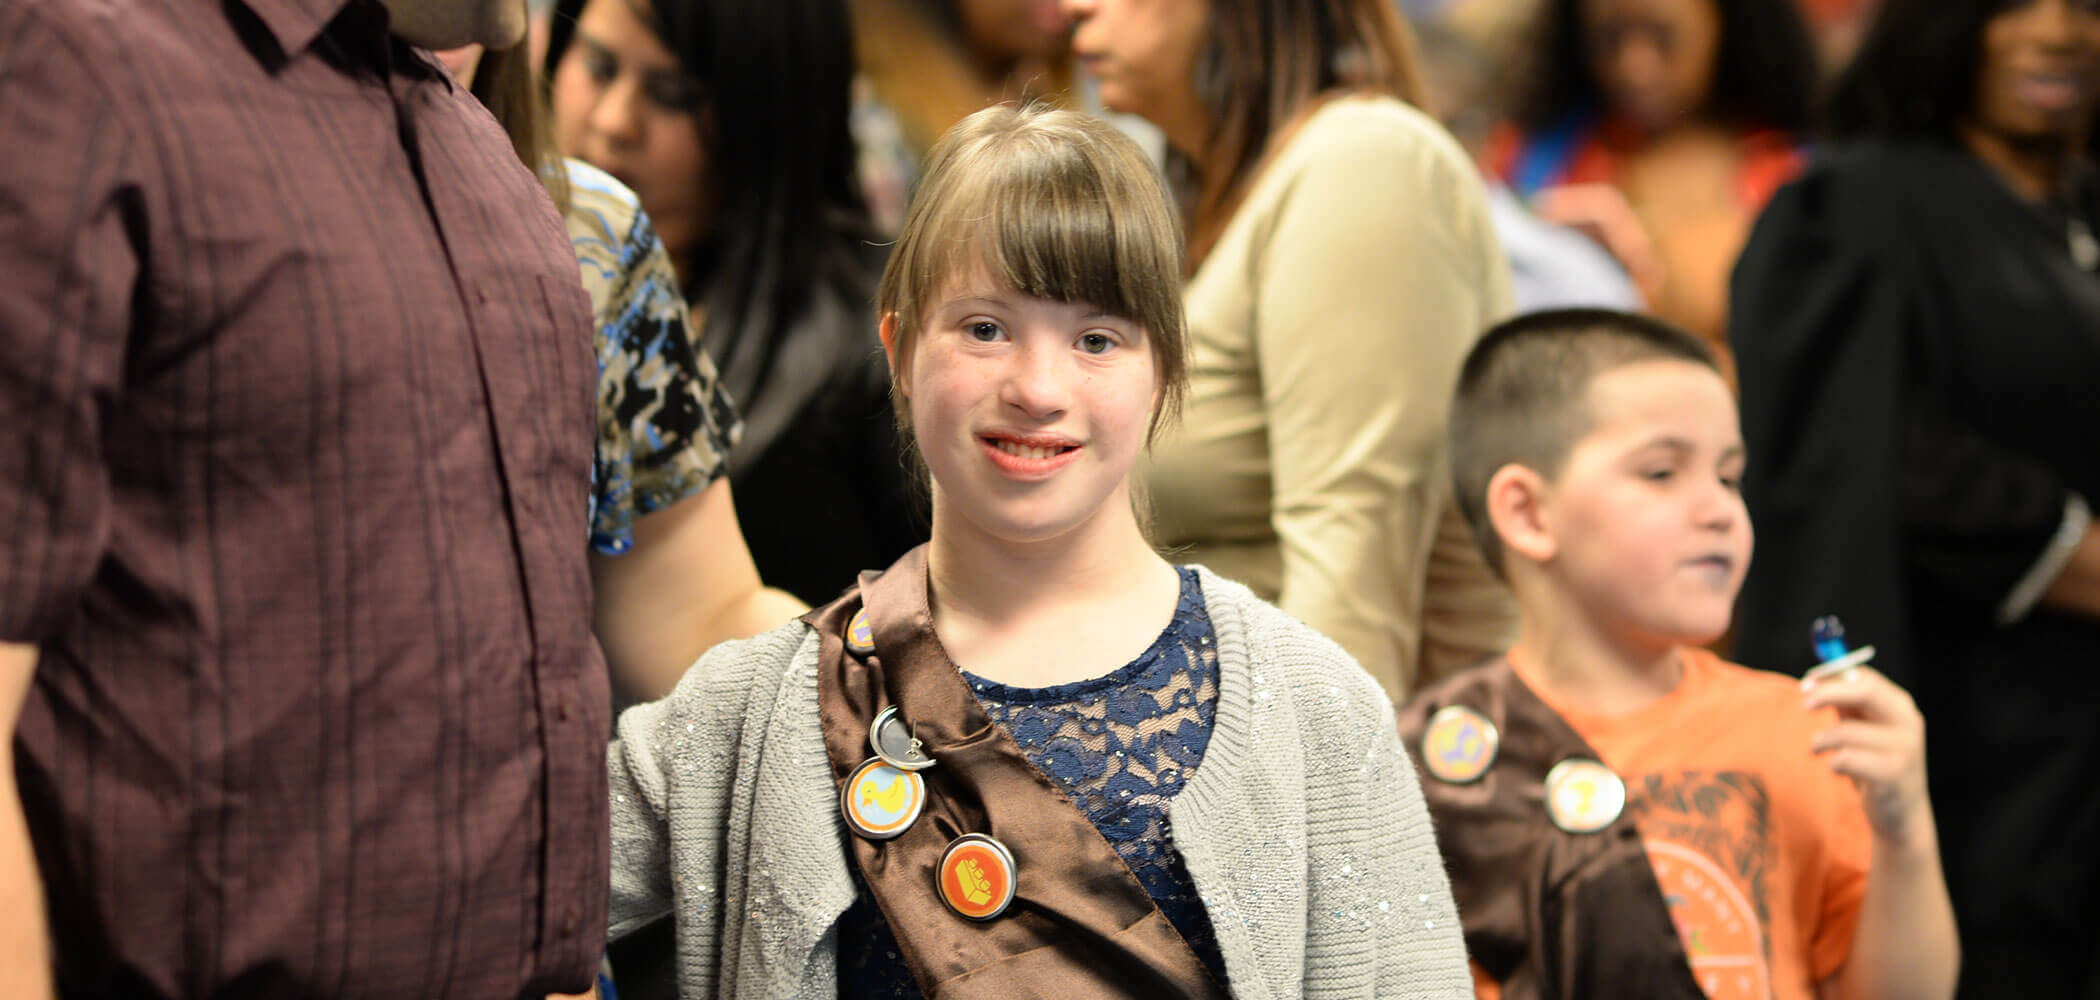 Girl smiling at Champions Club banquet